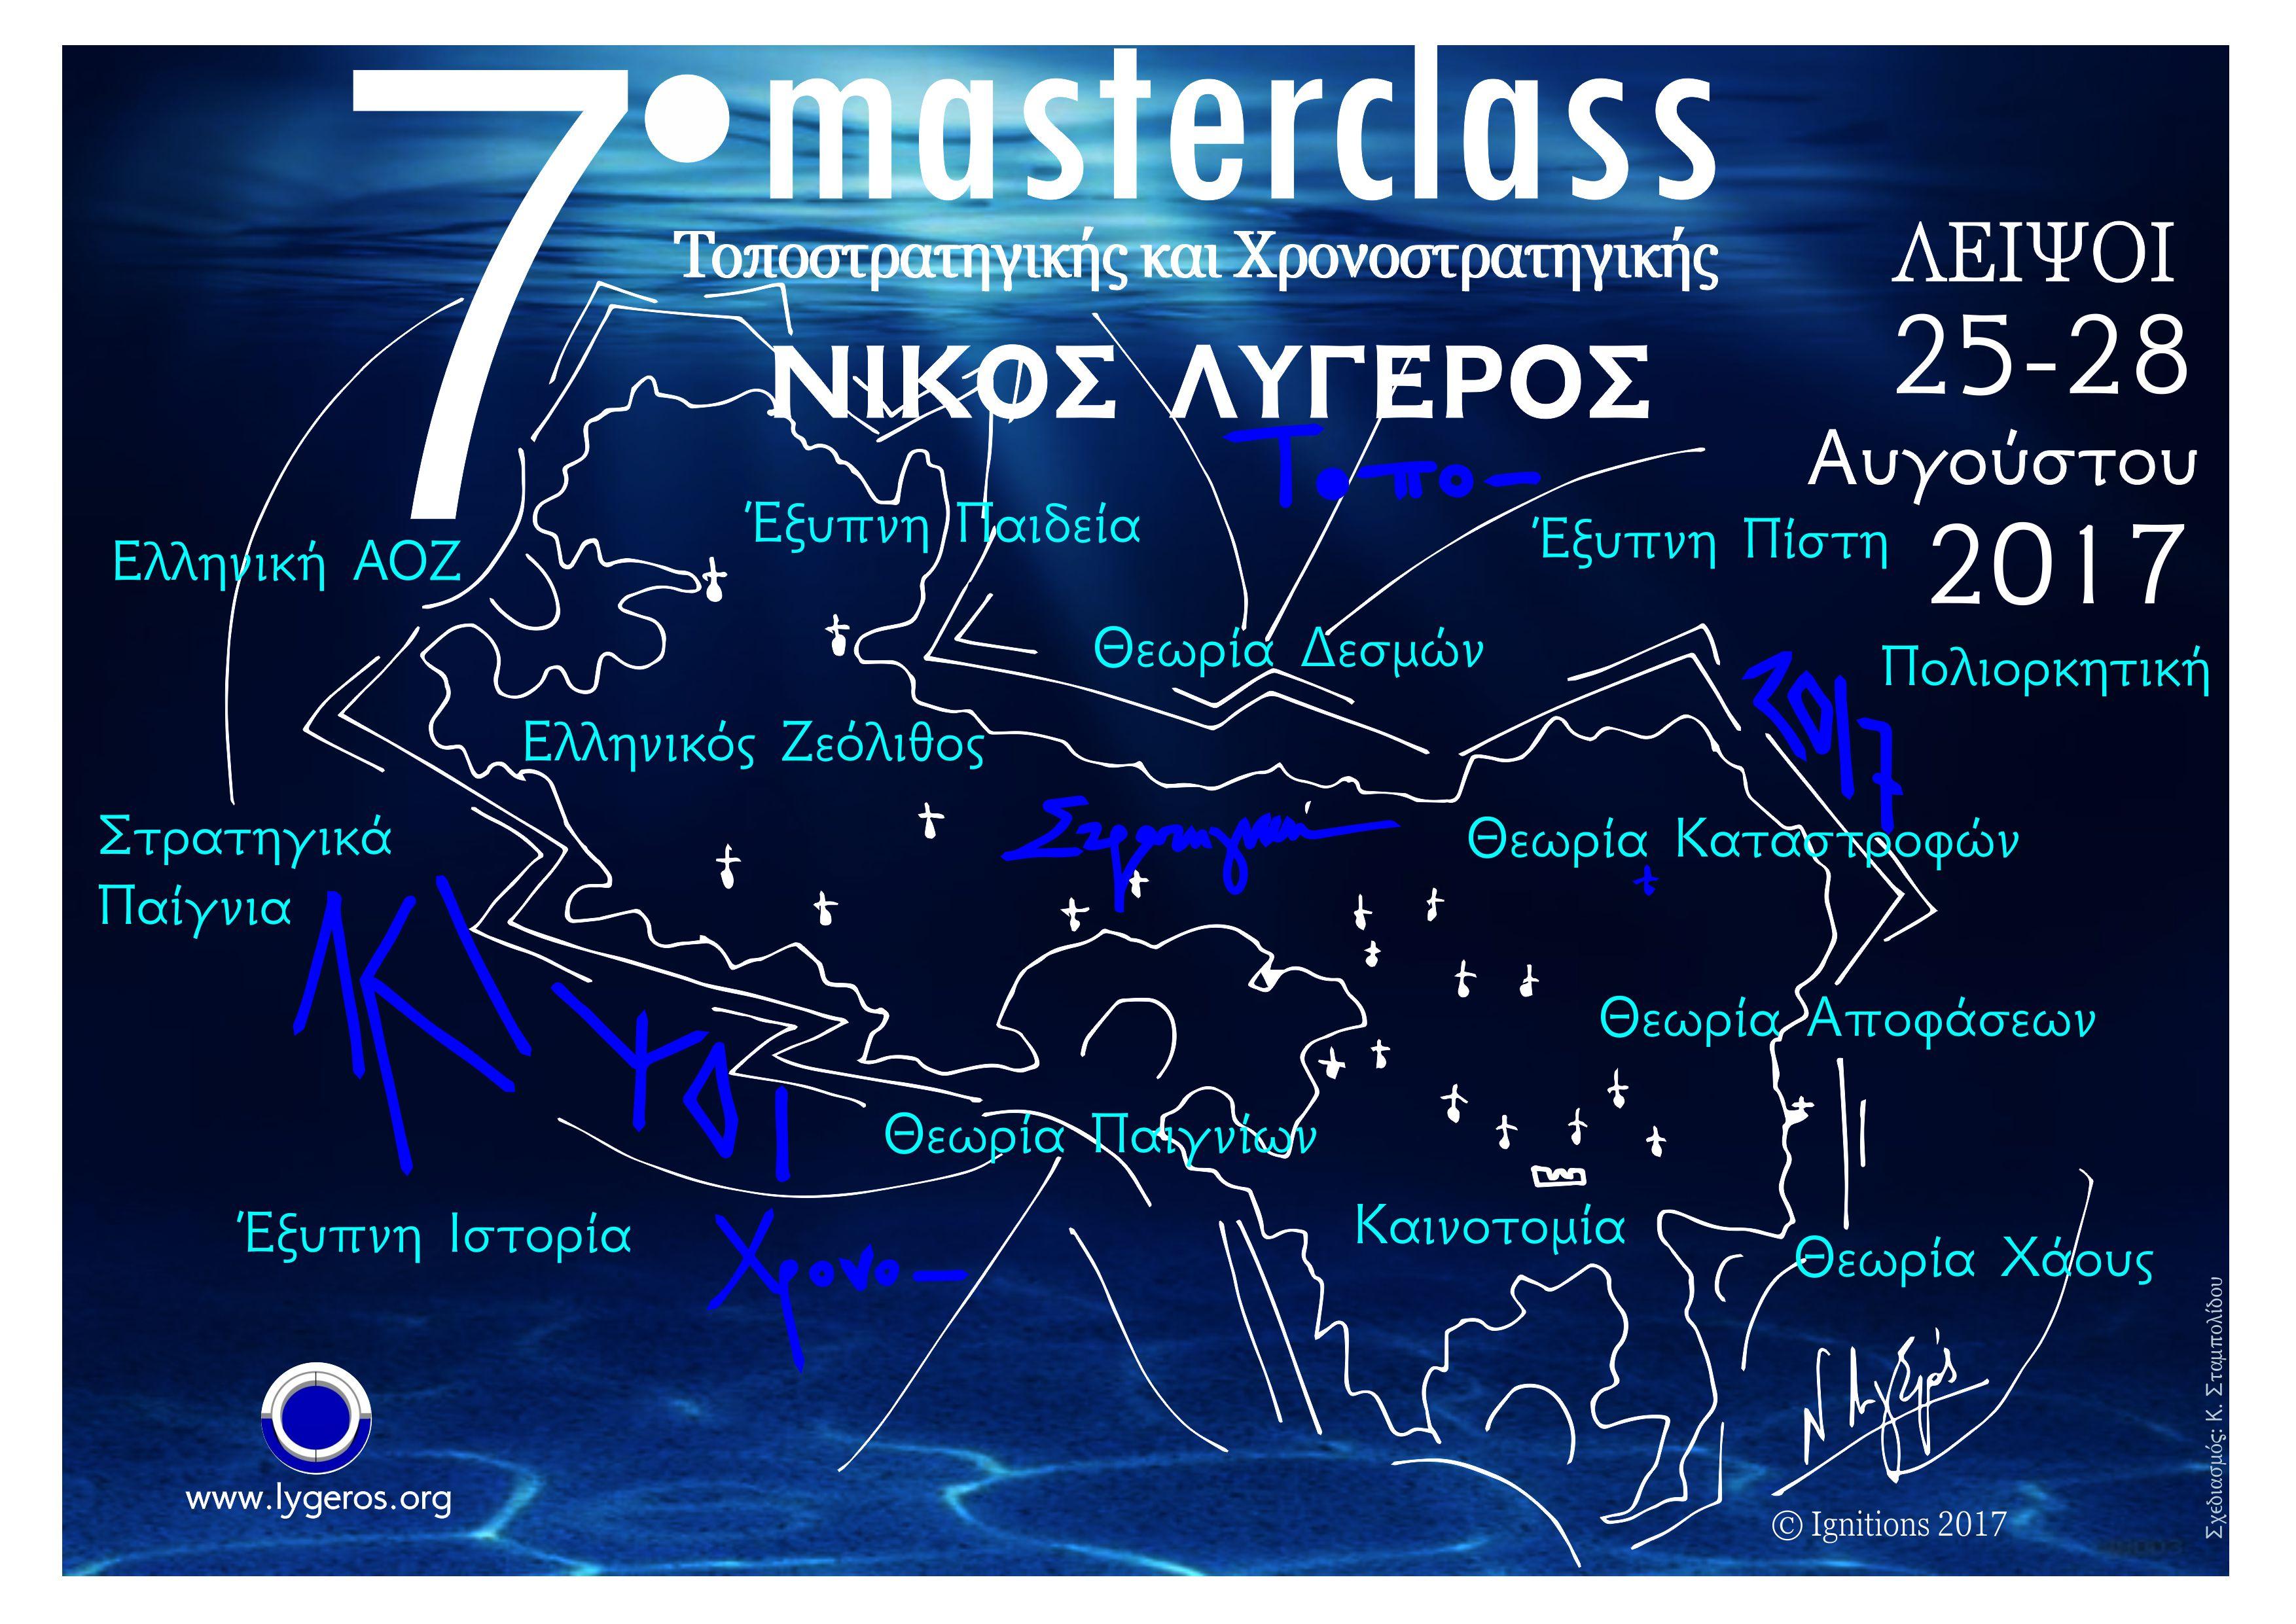 Masterclass: 7ο Masterclass Τοποστρατηγικής και Χρονοστρατηγικής